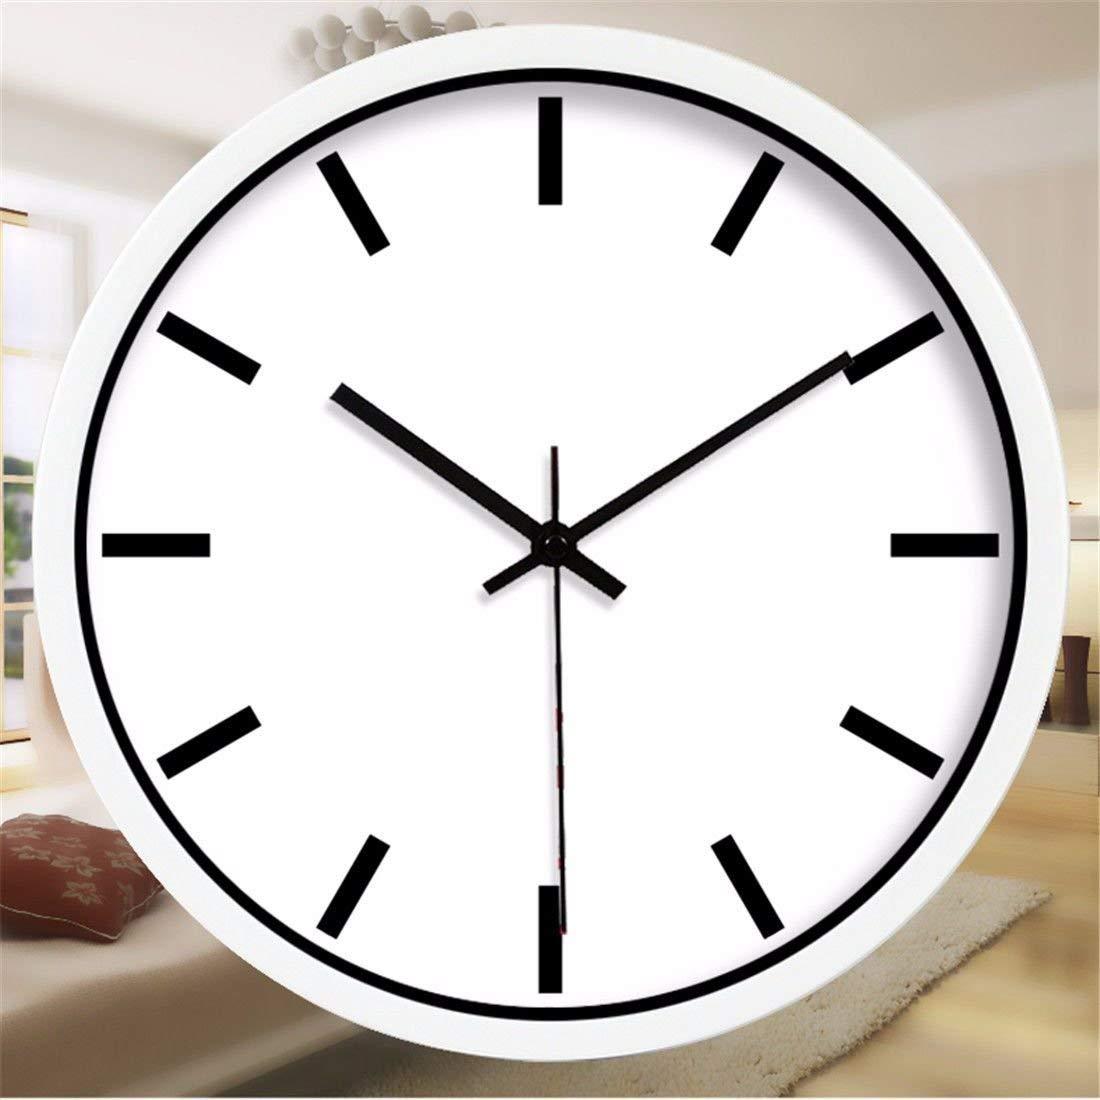 Chuangshengnet ウォールクロックノンチックナンバークォーツウォールクロックリビングルーム装飾的な屋内時計寝室の時計キッチン時計?シンプルモダン黒と白のアールデコ調のクリエイティブ時計   B07S7N7WJT